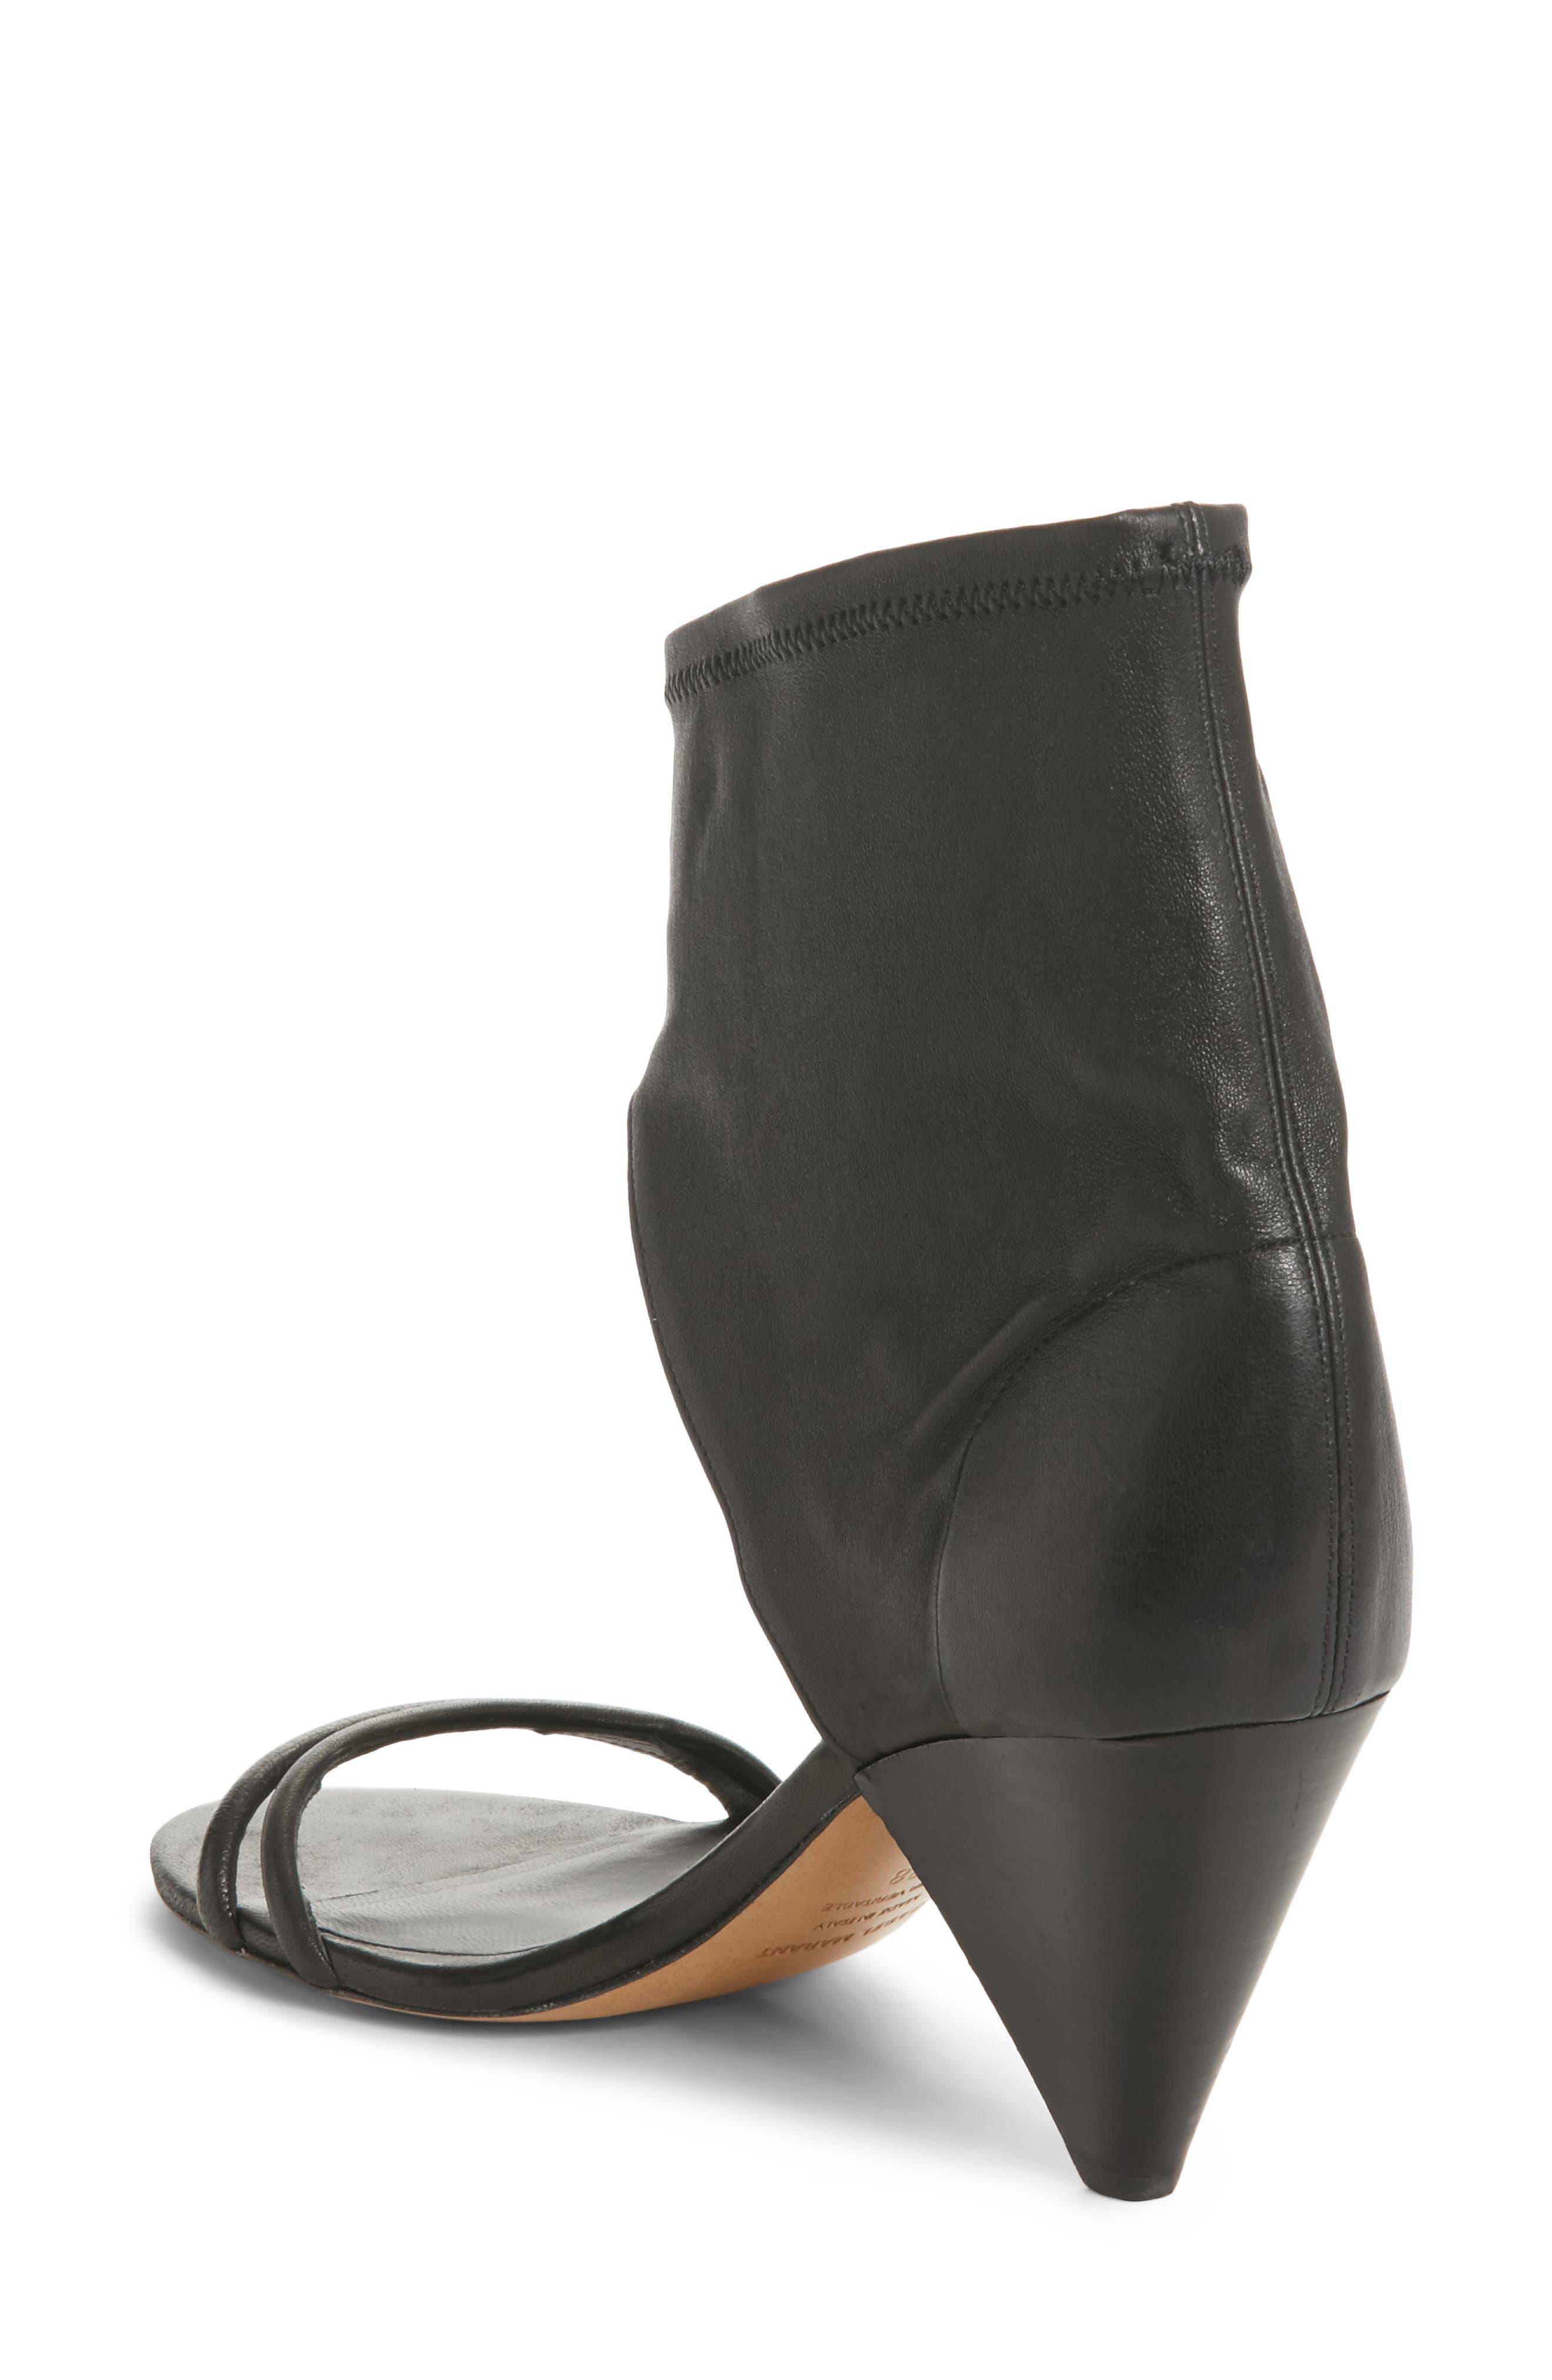 Melvy Ankle Shield Sandal,                             Alternate thumbnail 2, color,